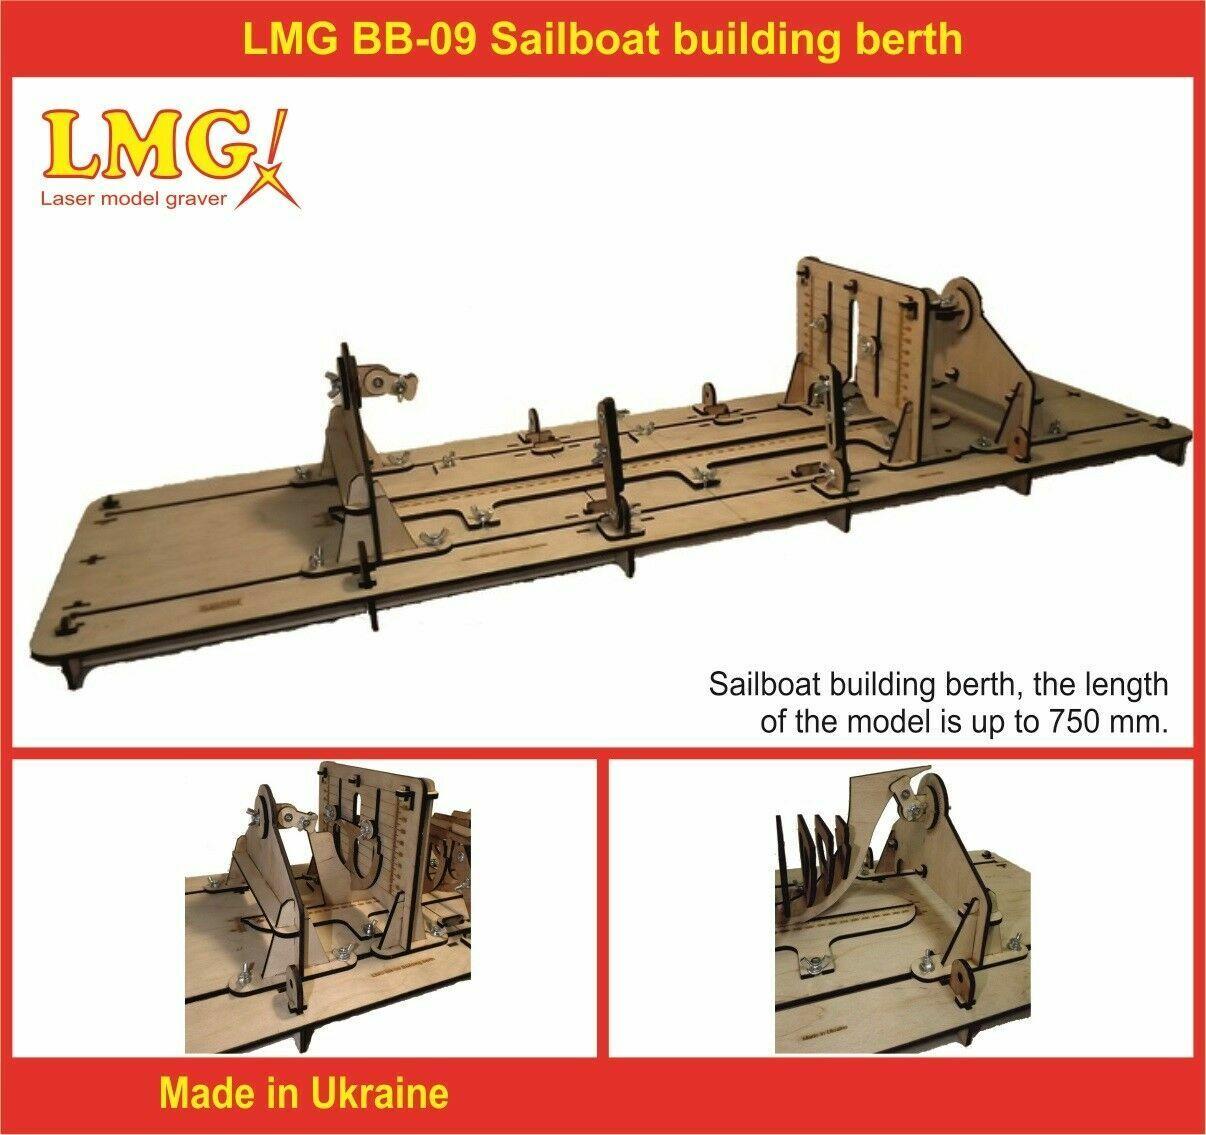 LMG BB-09 Sailboat building berth for plastic model kit, storing system, stand